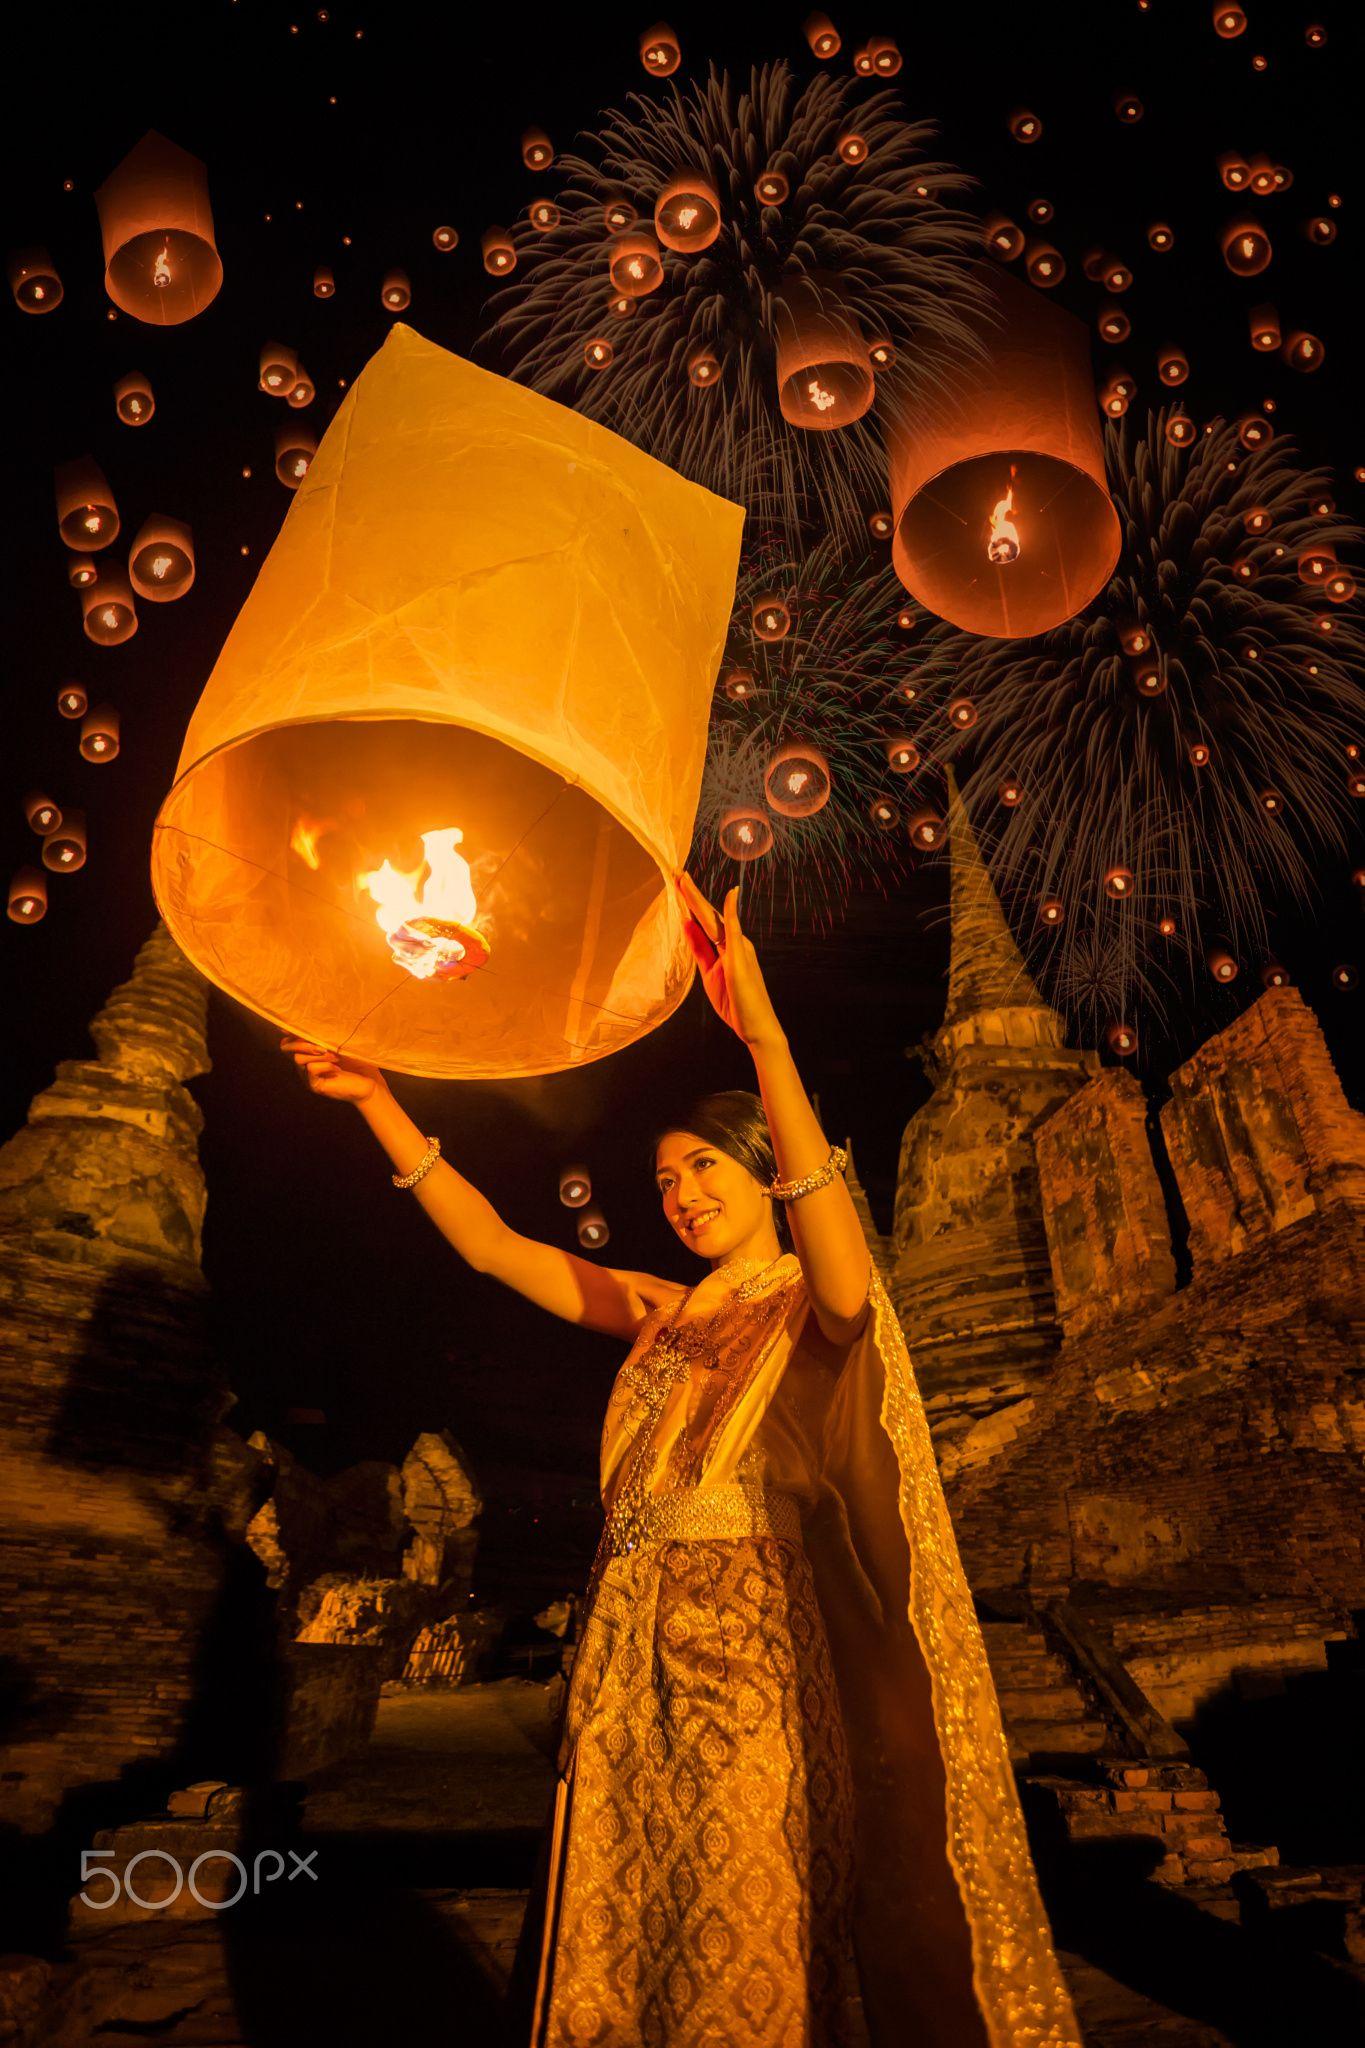 Thai woman floating lamp - Thai woman floating lamp in Wat Phrasisanpetch at Ayutthaya,Thailand